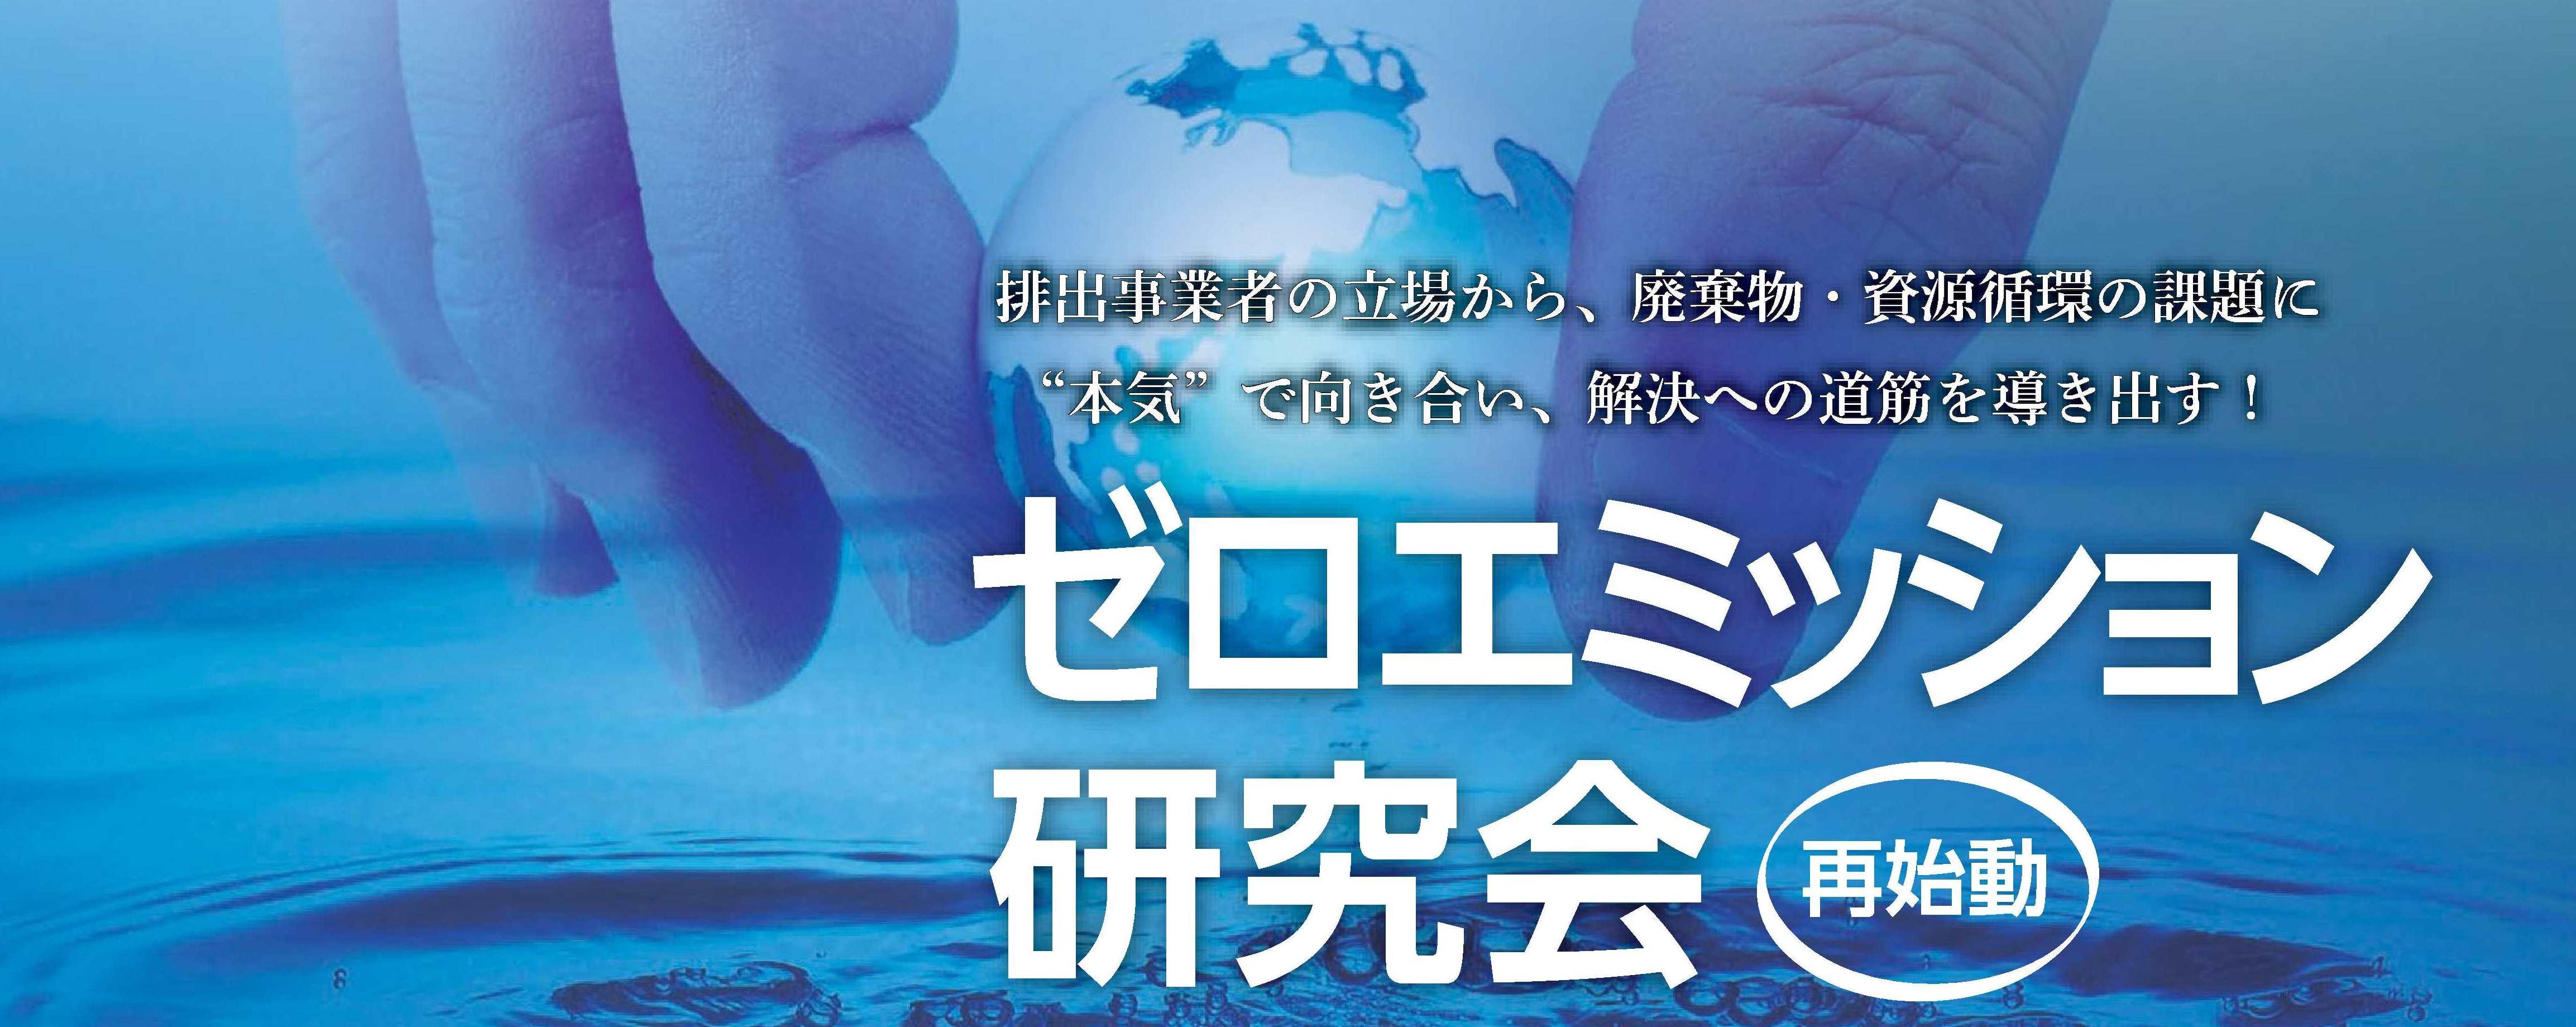 201704SEFゼロエミ研究会募集チラシ